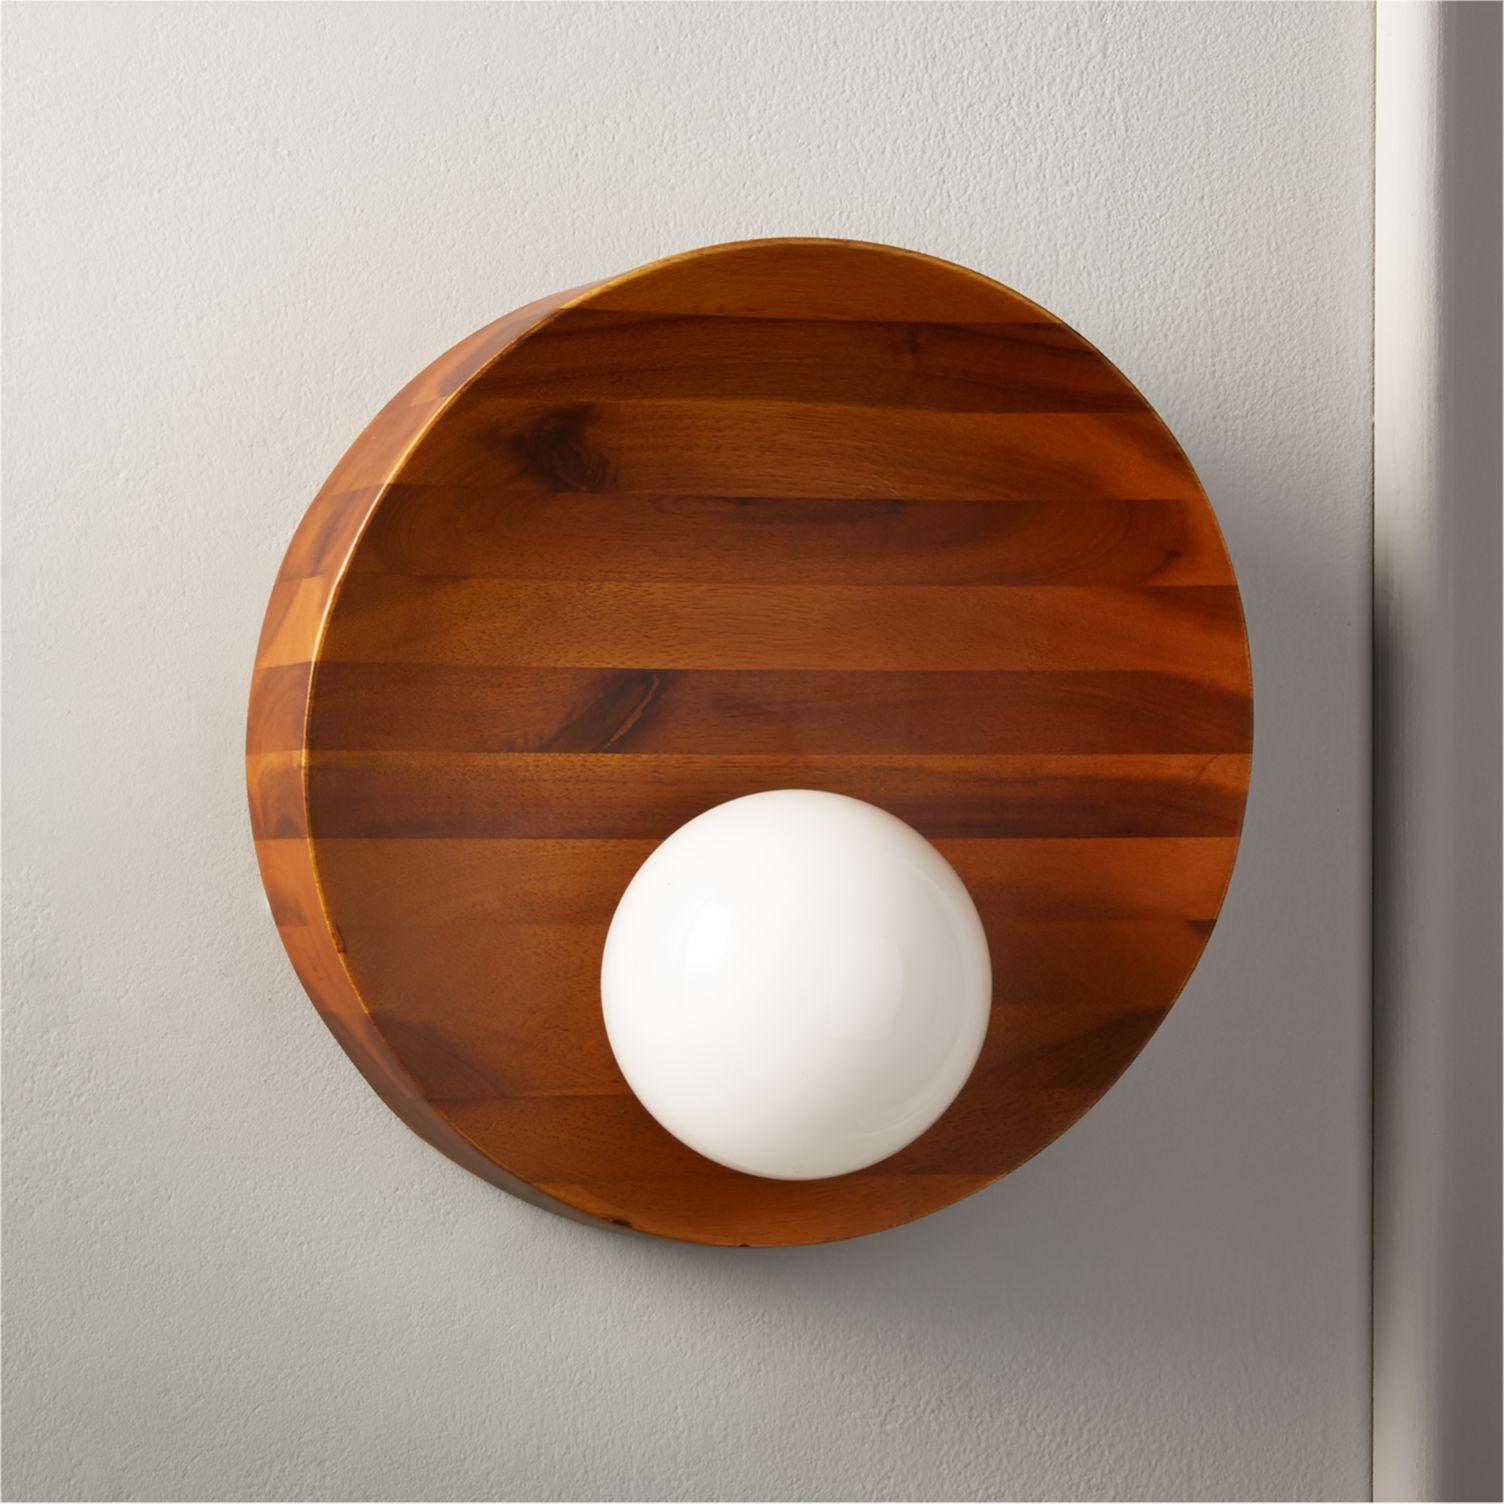 Circular-acacia-wood-sconce